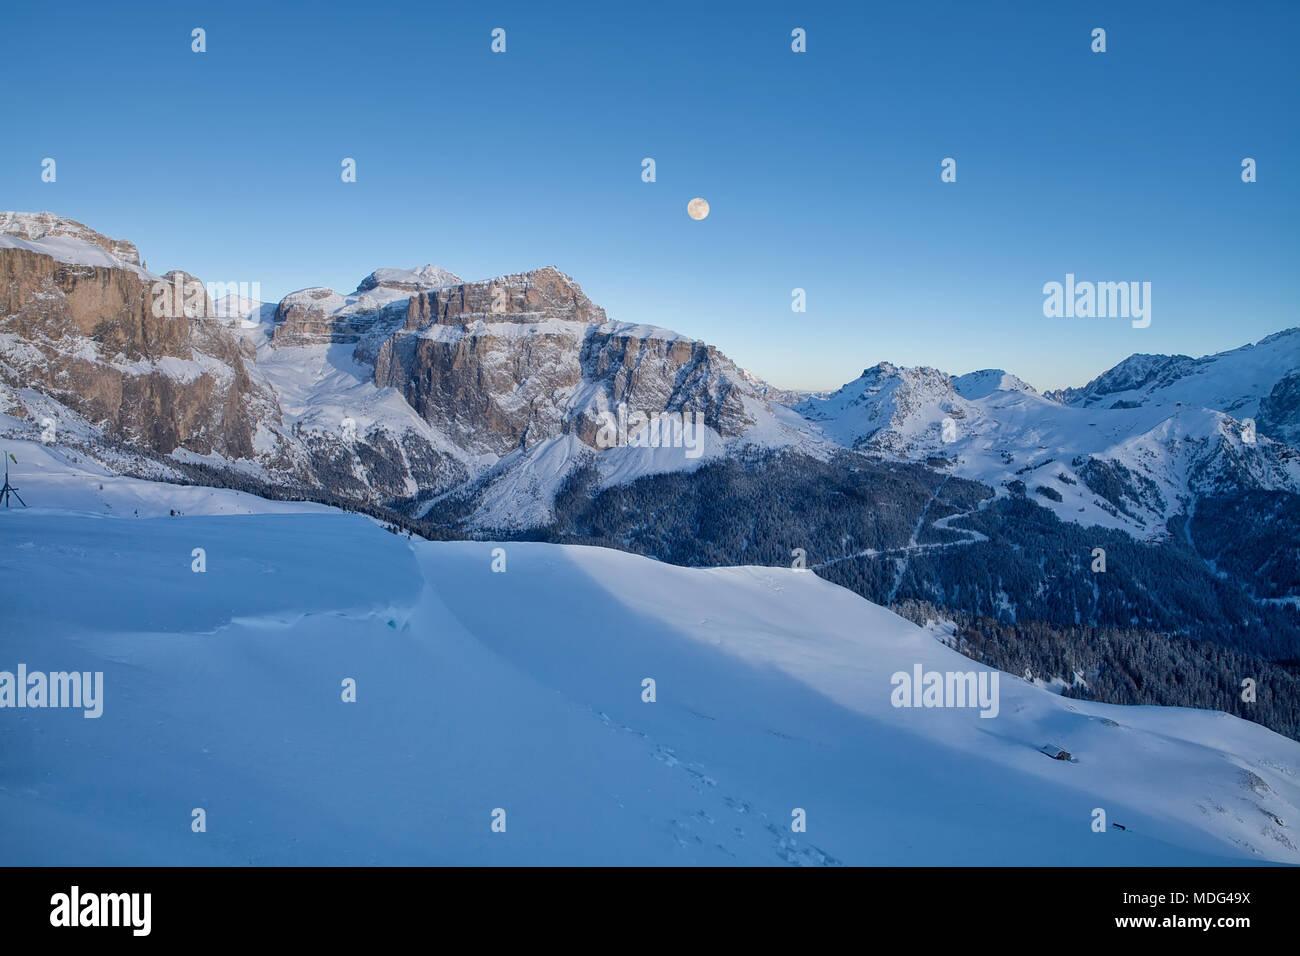 Panoramic view of the Val Di Fassa ski resort in Italy, Dolomites, Trentino-Alto-Adige region, Italy - Stock Image